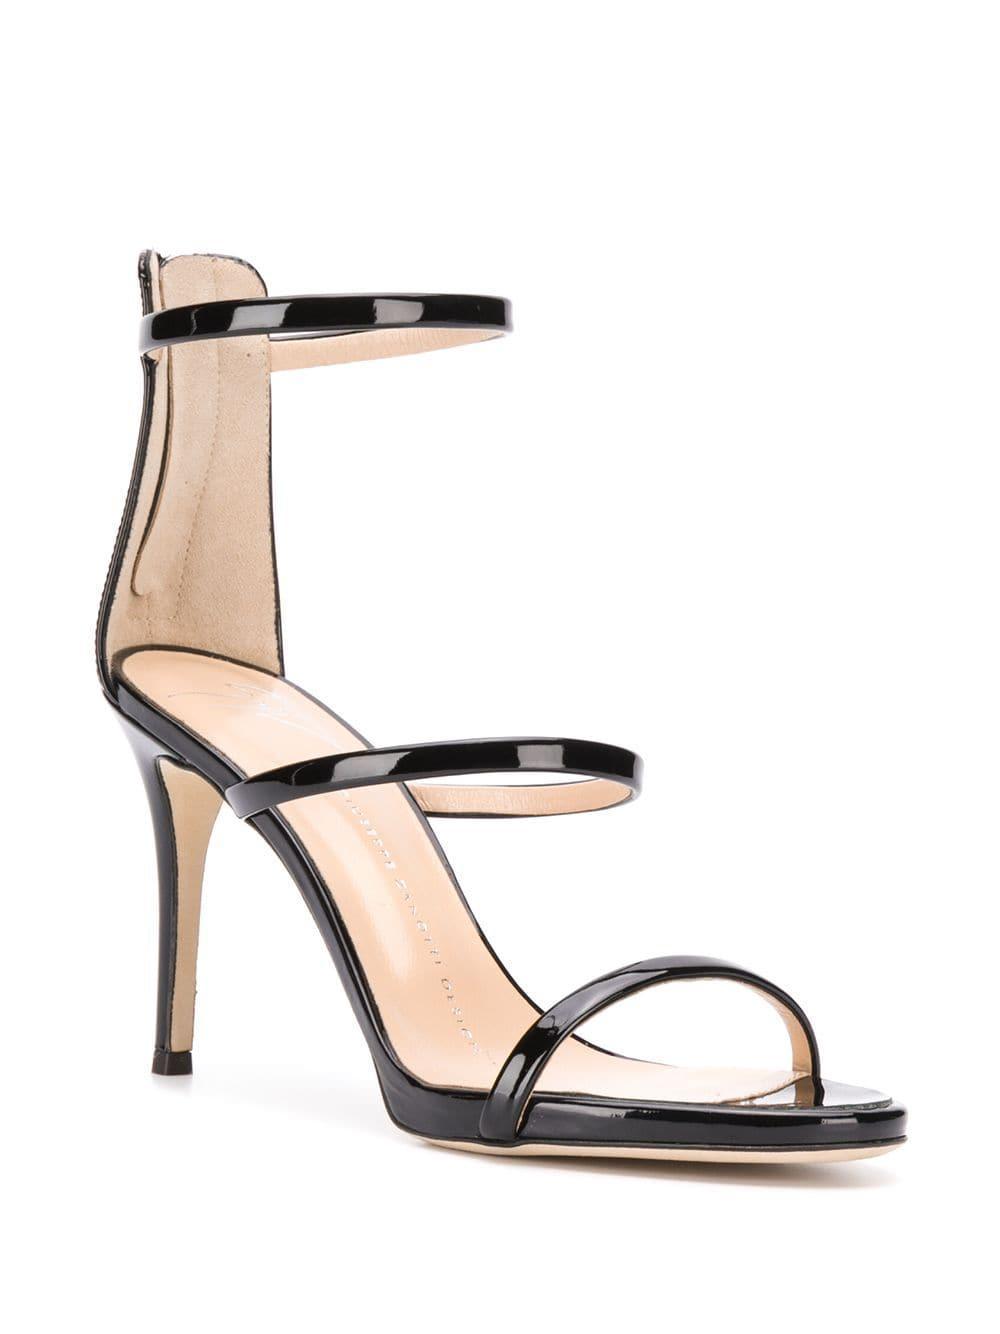 820b3ab8d7784 Lyst - Giuseppe Zanotti Harmony Sandals in Black